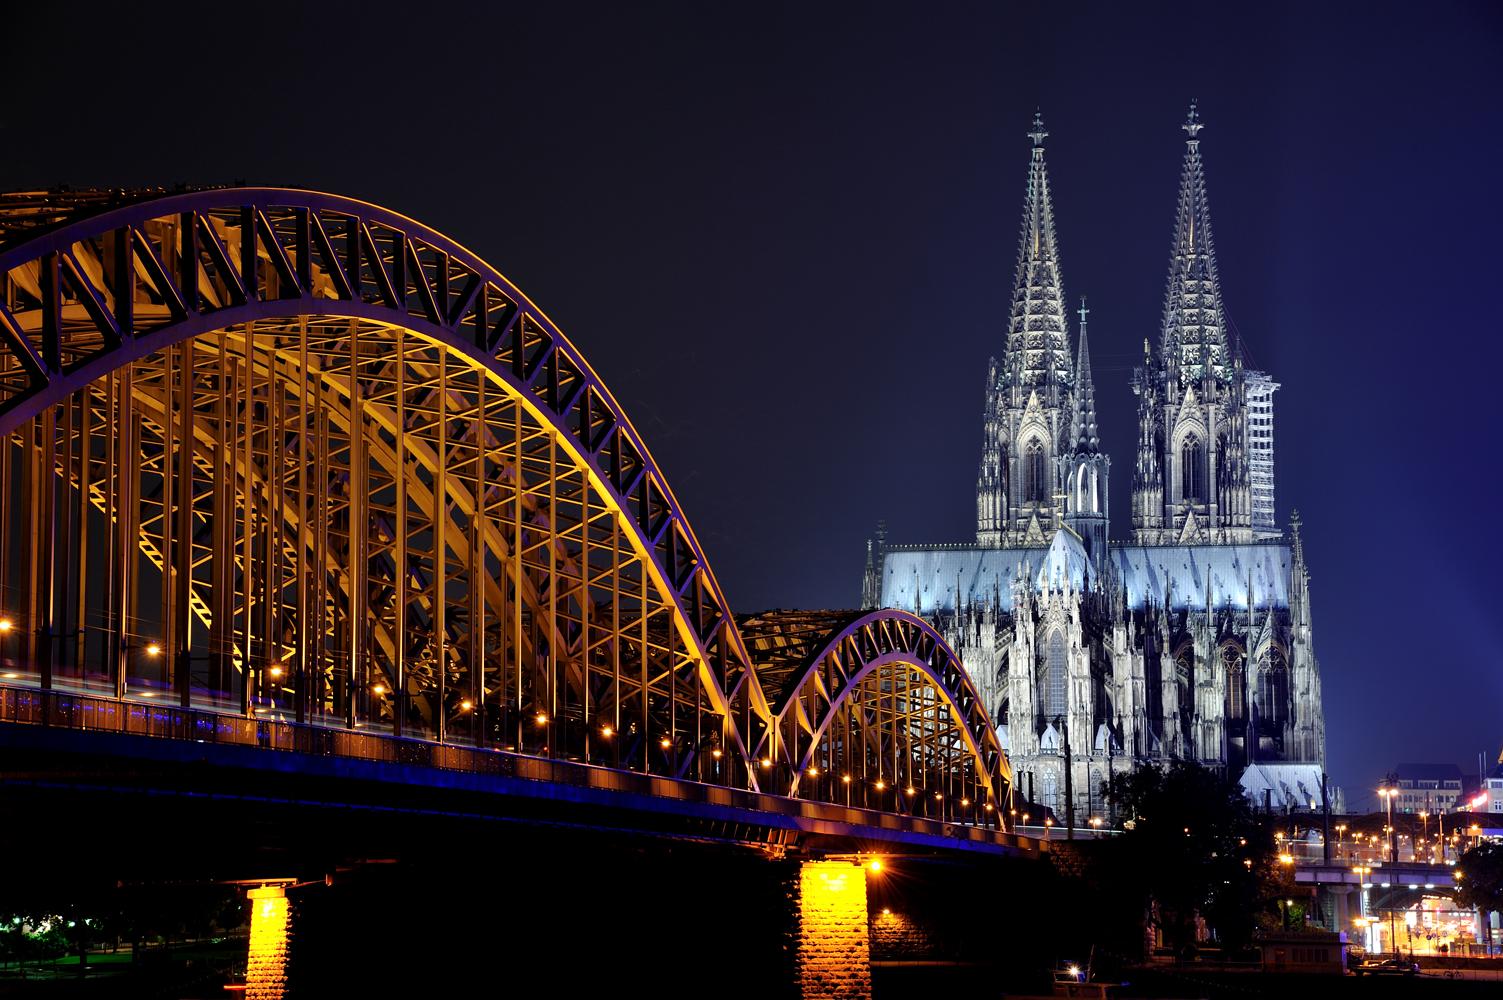 Nachtfotokurs am 5.10.2013 in Köln (4)